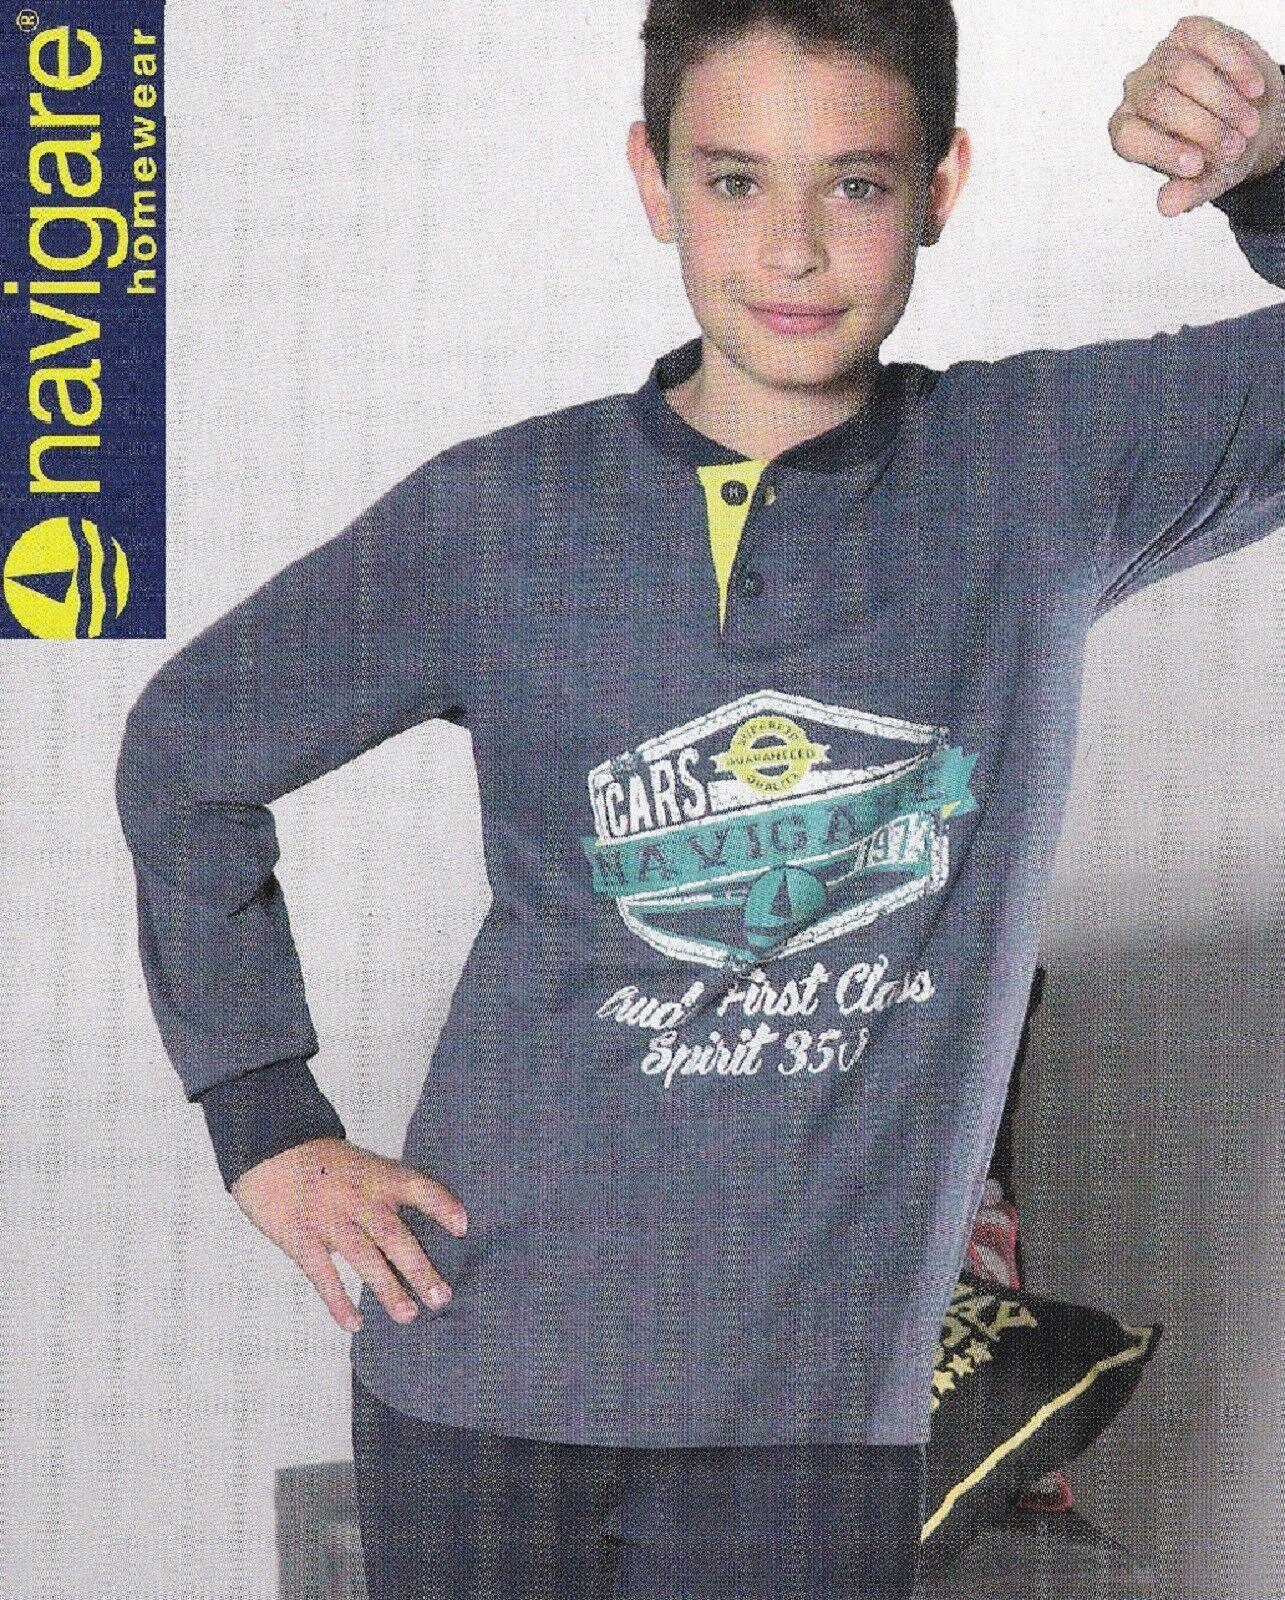 Pigiama Ragazzo Cotone Jersey, Pantalone + Manica lunga. NAVIGARE homewear 15421